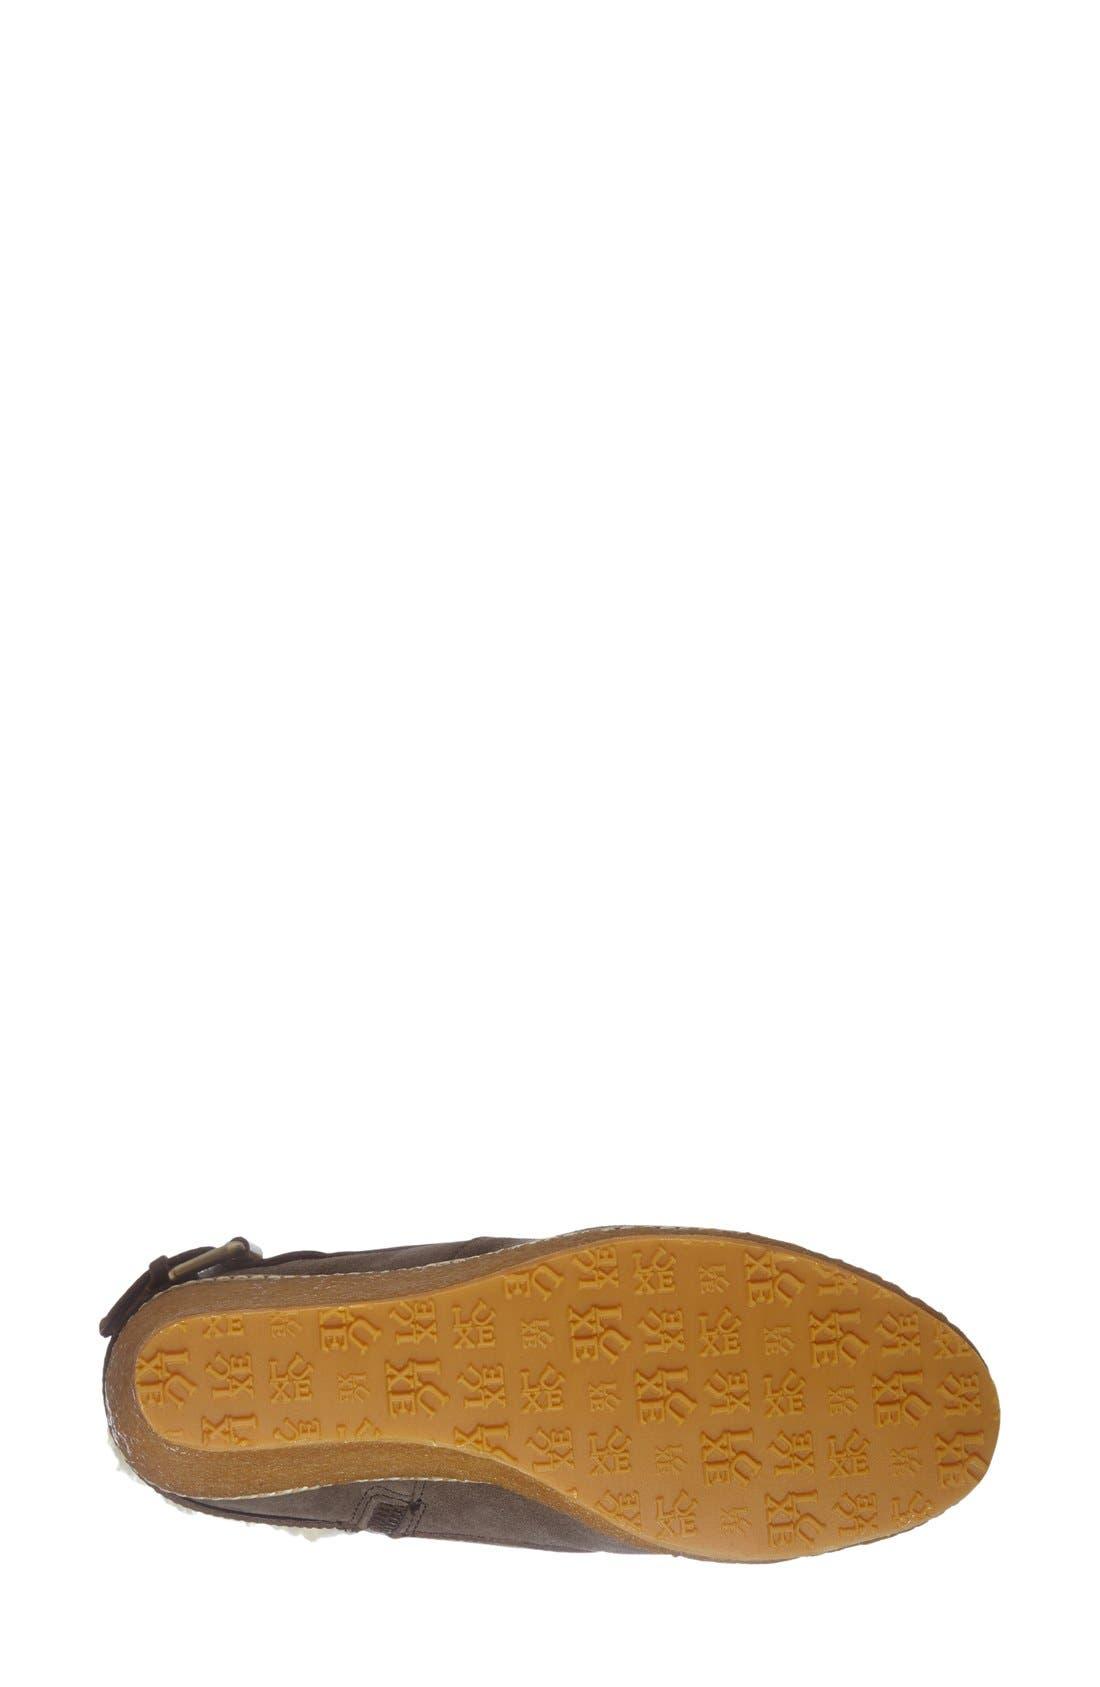 Alternate Image 4  - Australia Luxe Collective 'Monk' Genuine Calf Hair & Shearling Boot (Women)